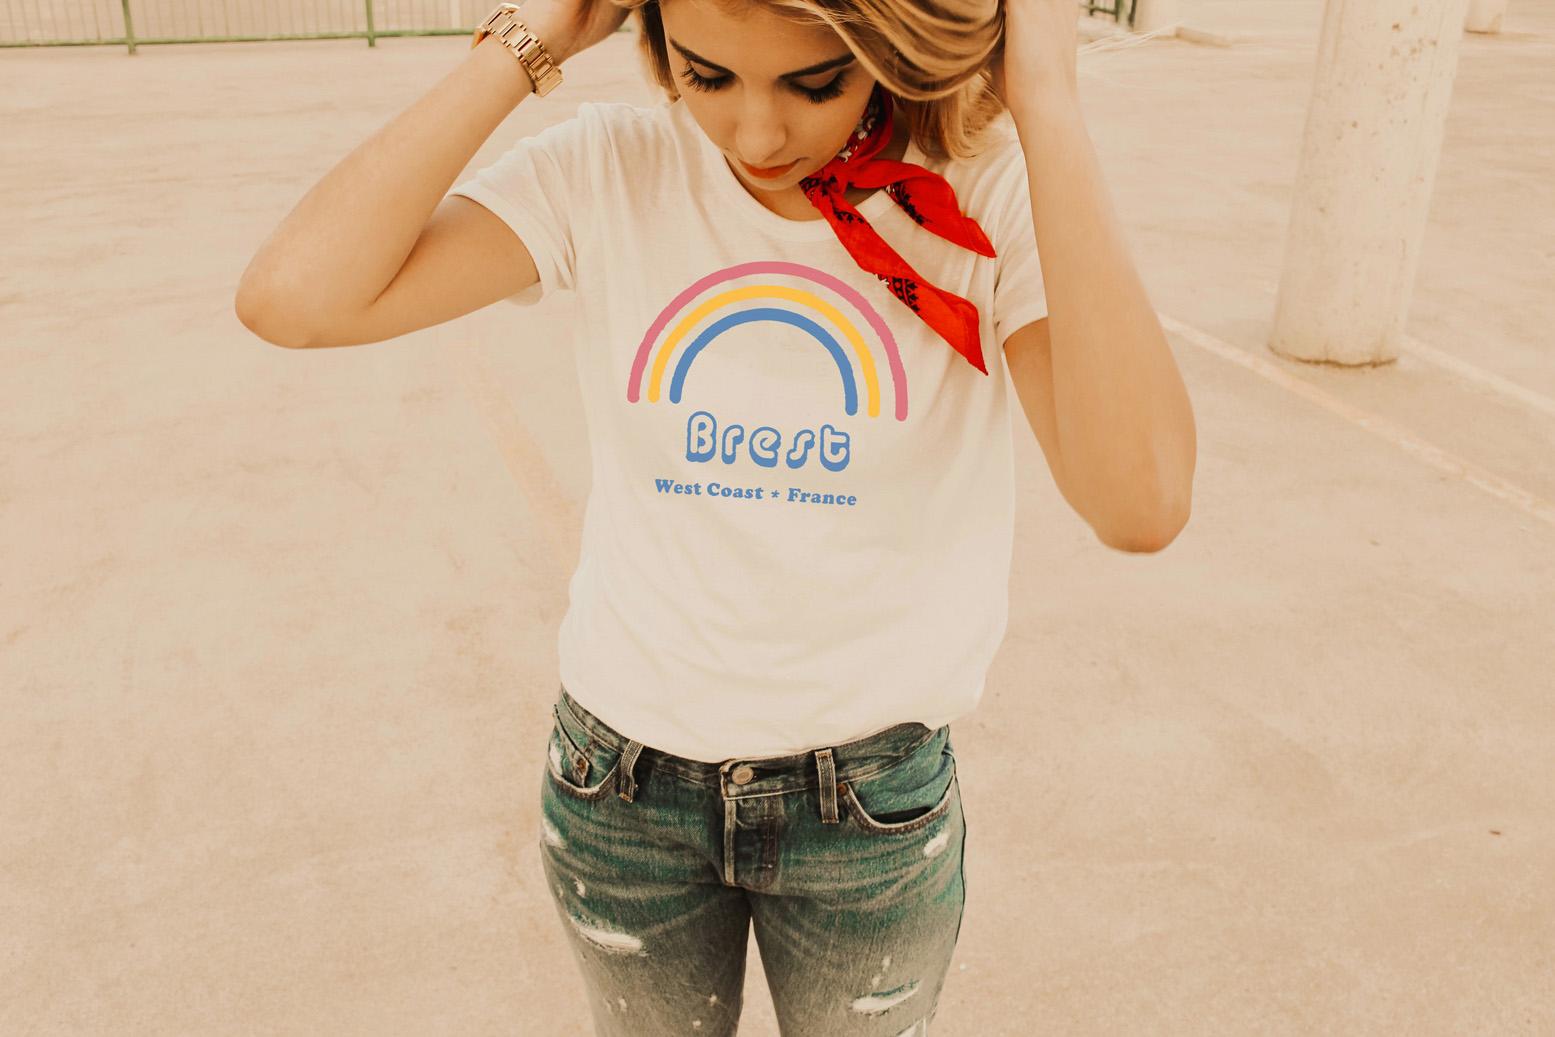 fabulosamente Brest fresca Camiseta mujer de de JlcF1TK